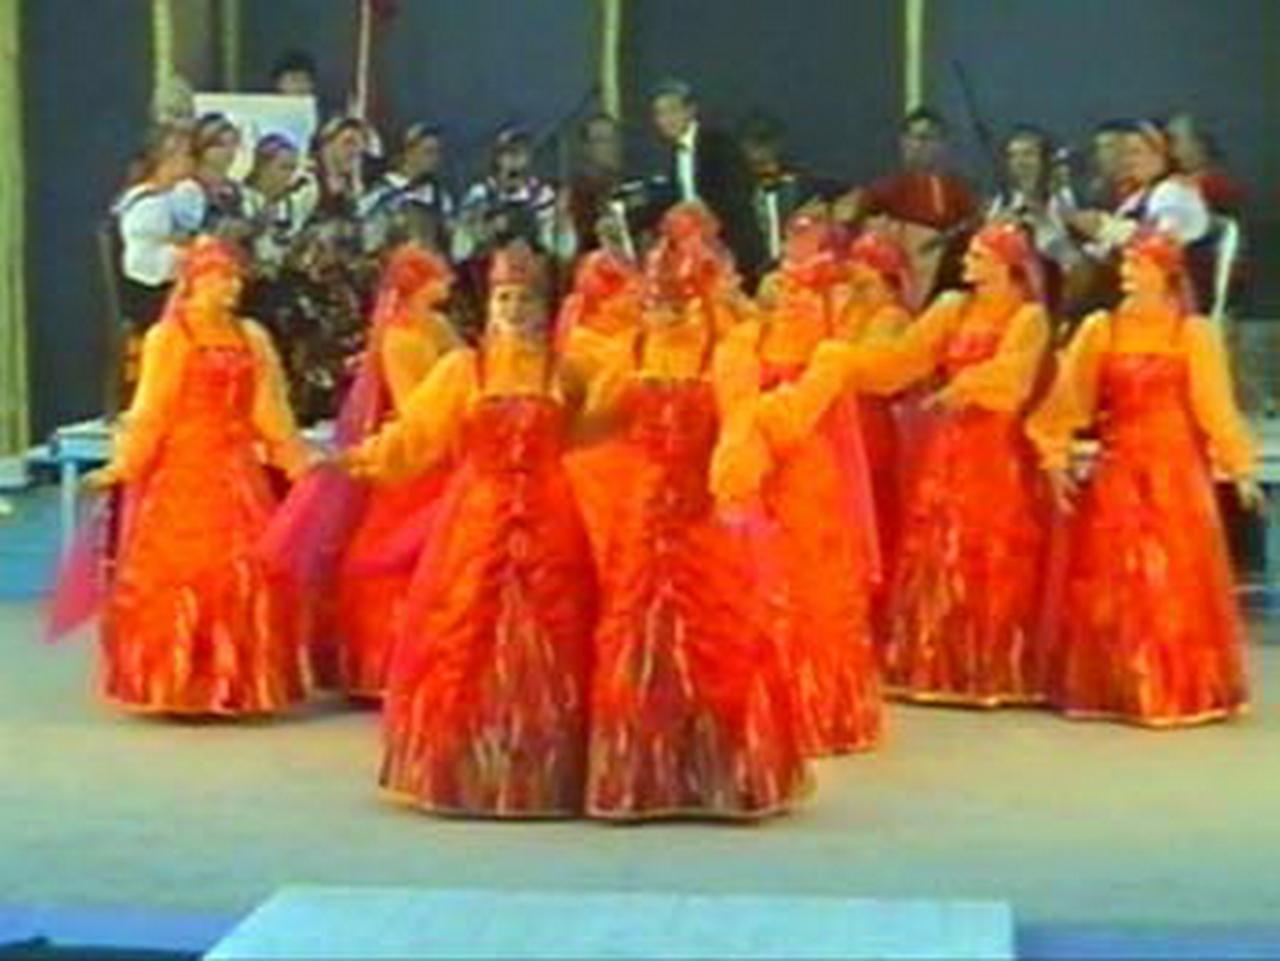 1997 - Ansamblul folcloric \'\'Russkie Napevy\'\' - Rusia